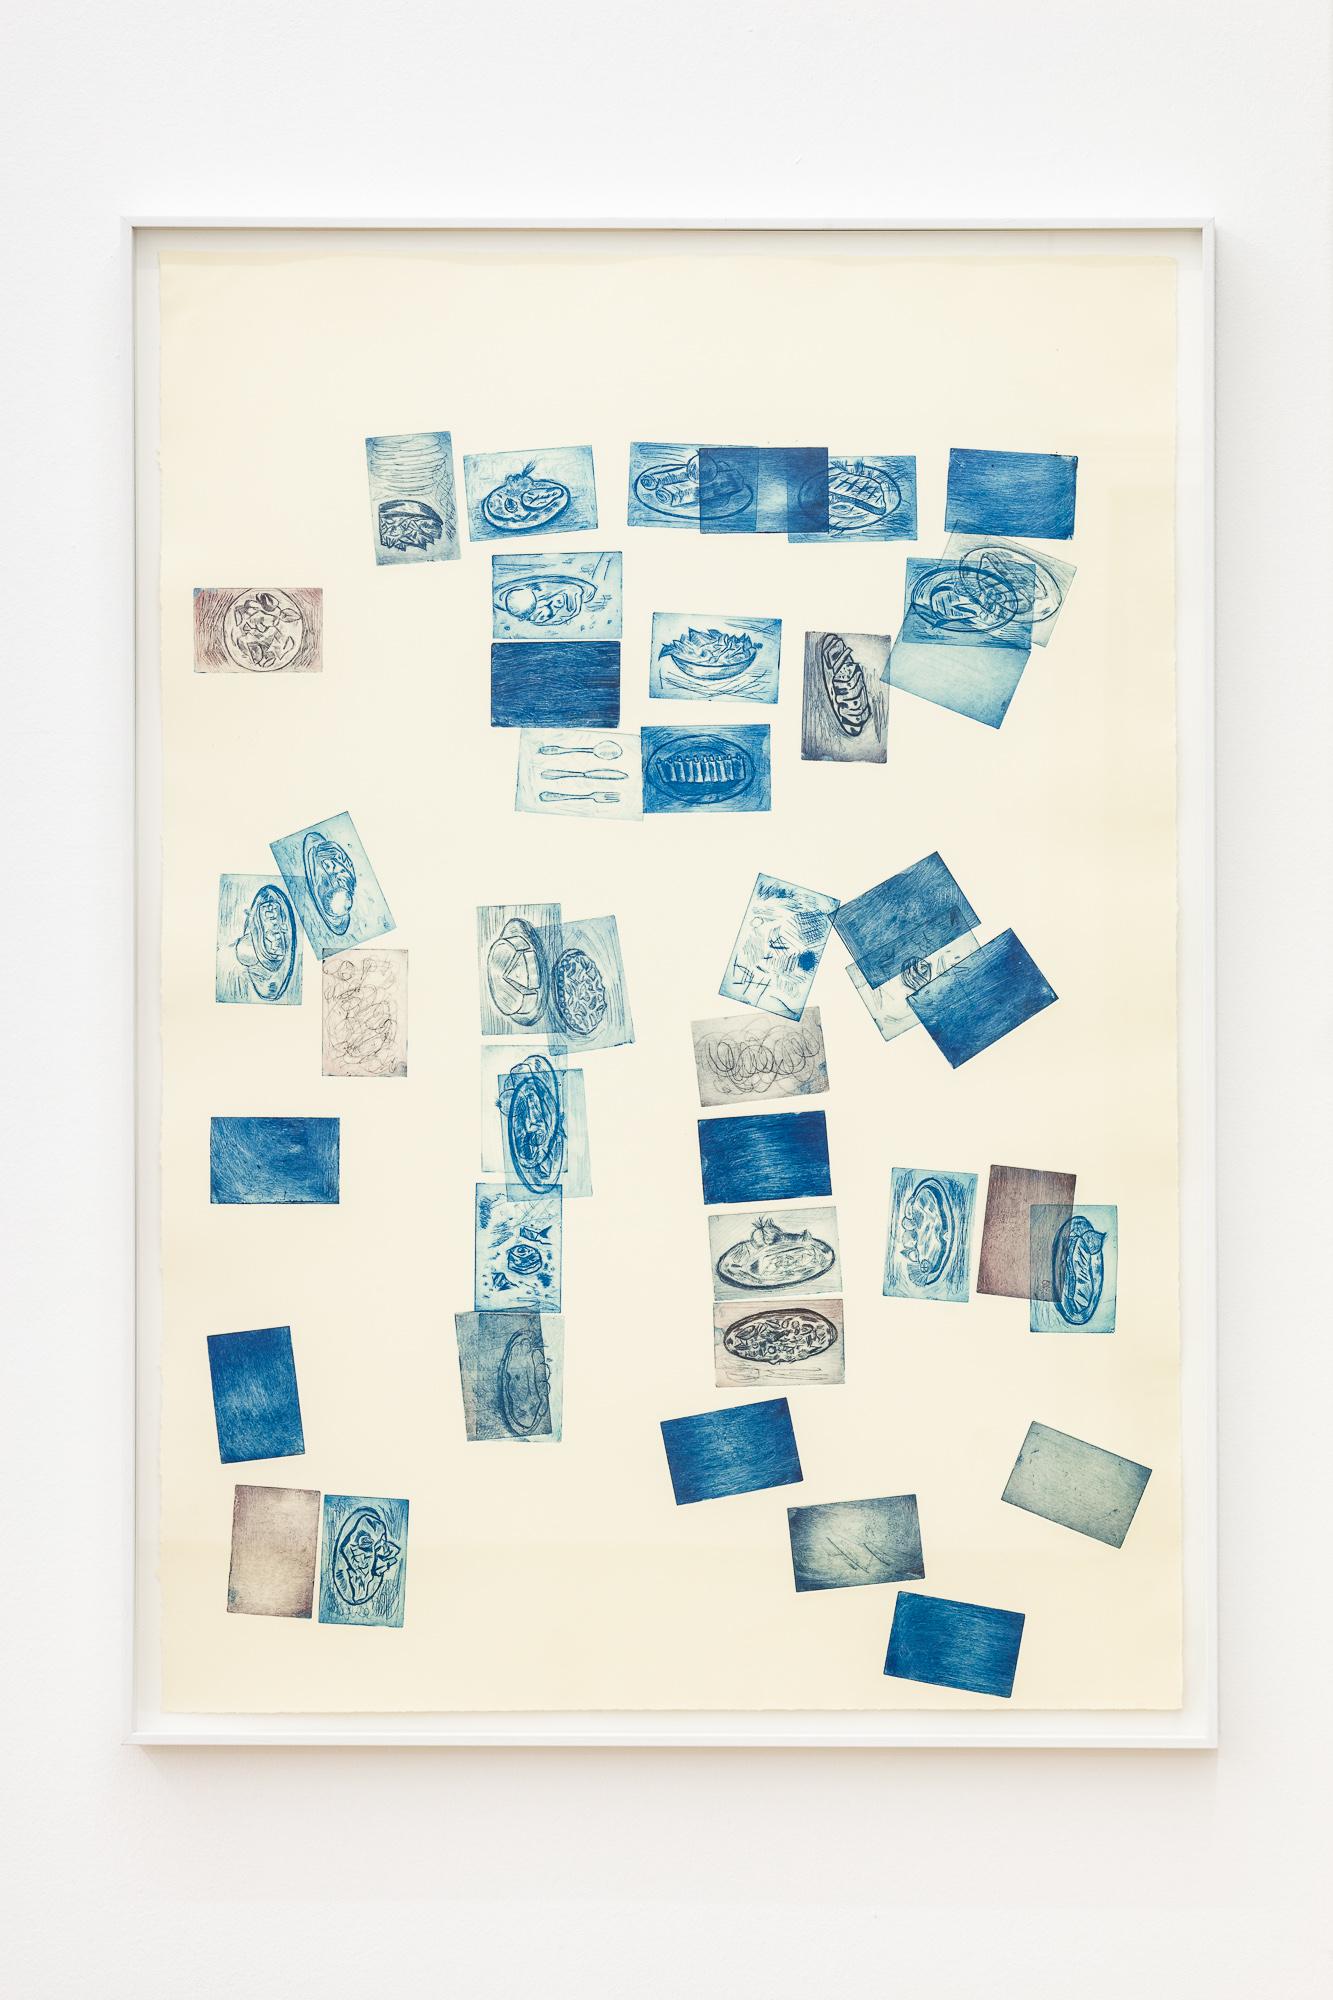 2019_01_25_Knut Ivar Aaser at Felix Gaudlitz_by kunst-dokumentationcom_Werkbilder_017_web.jpg